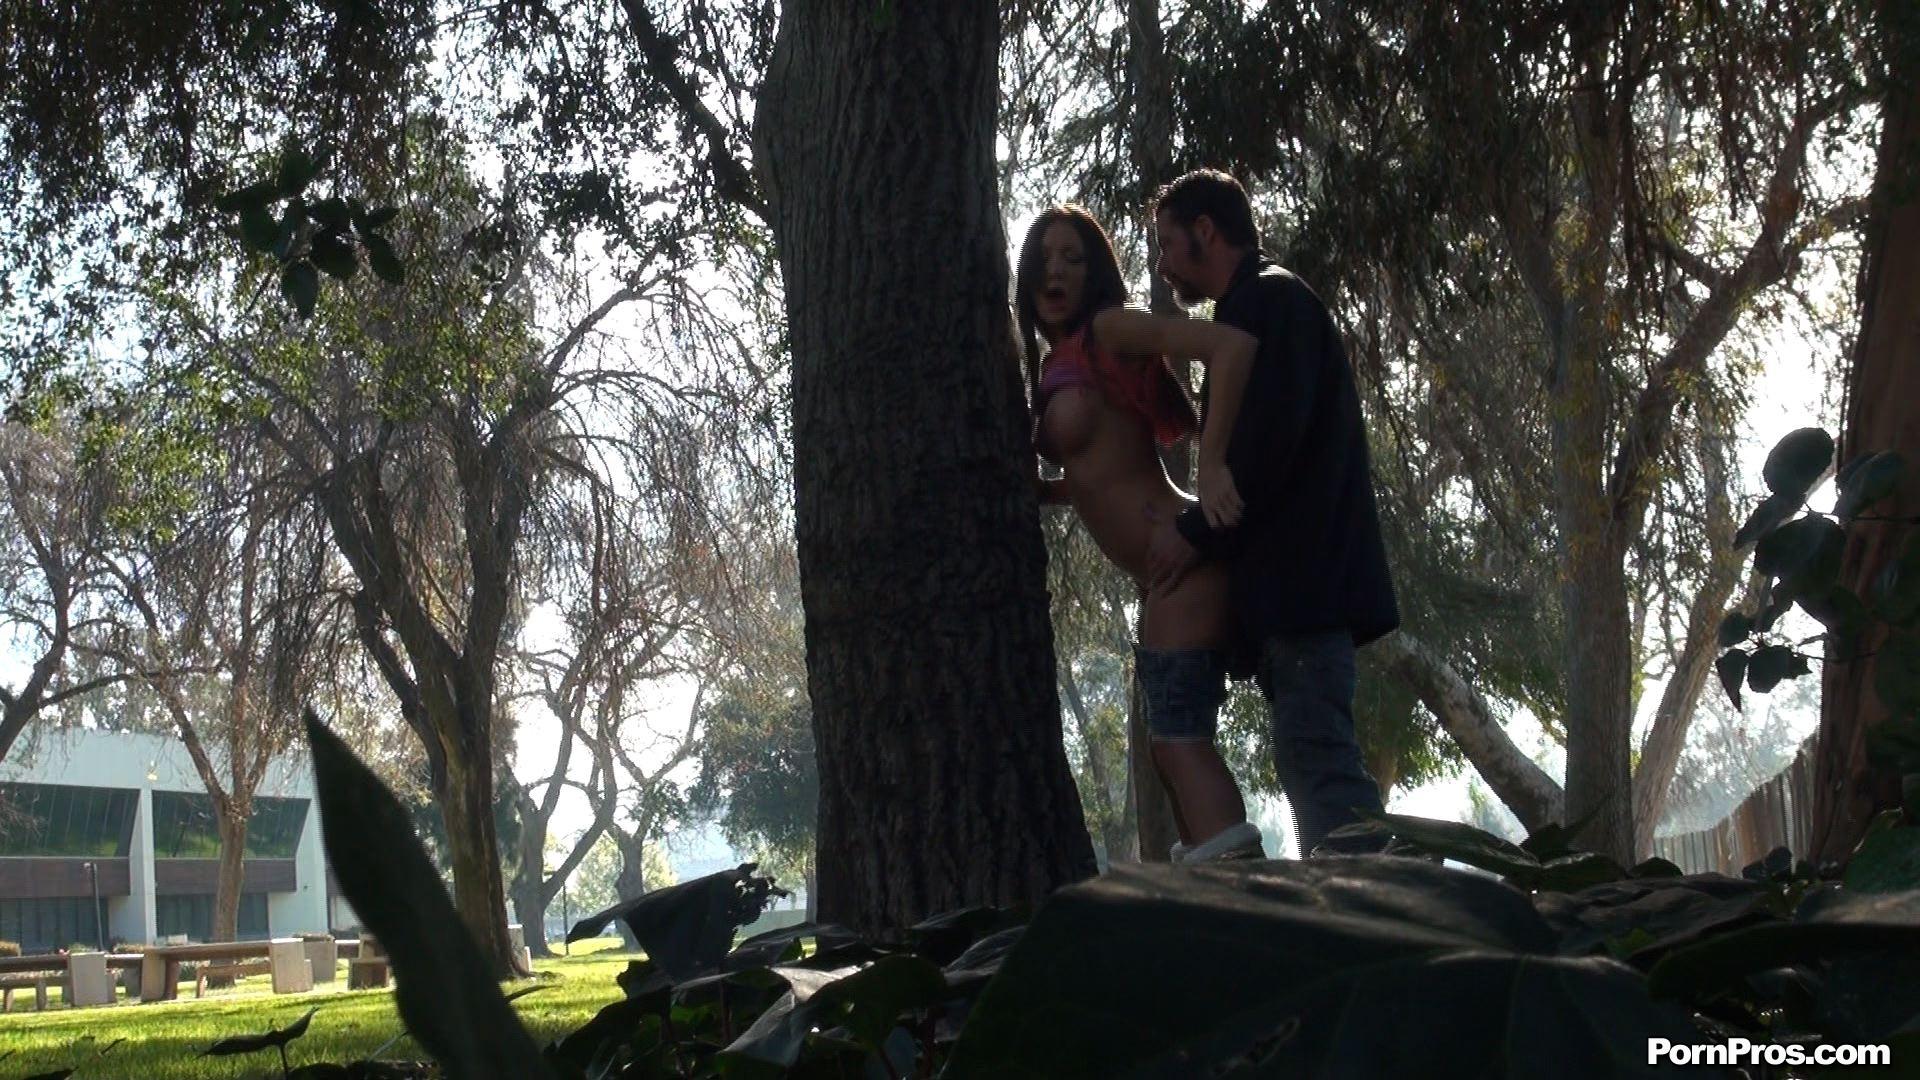 Секс посреди леса 7 фотография